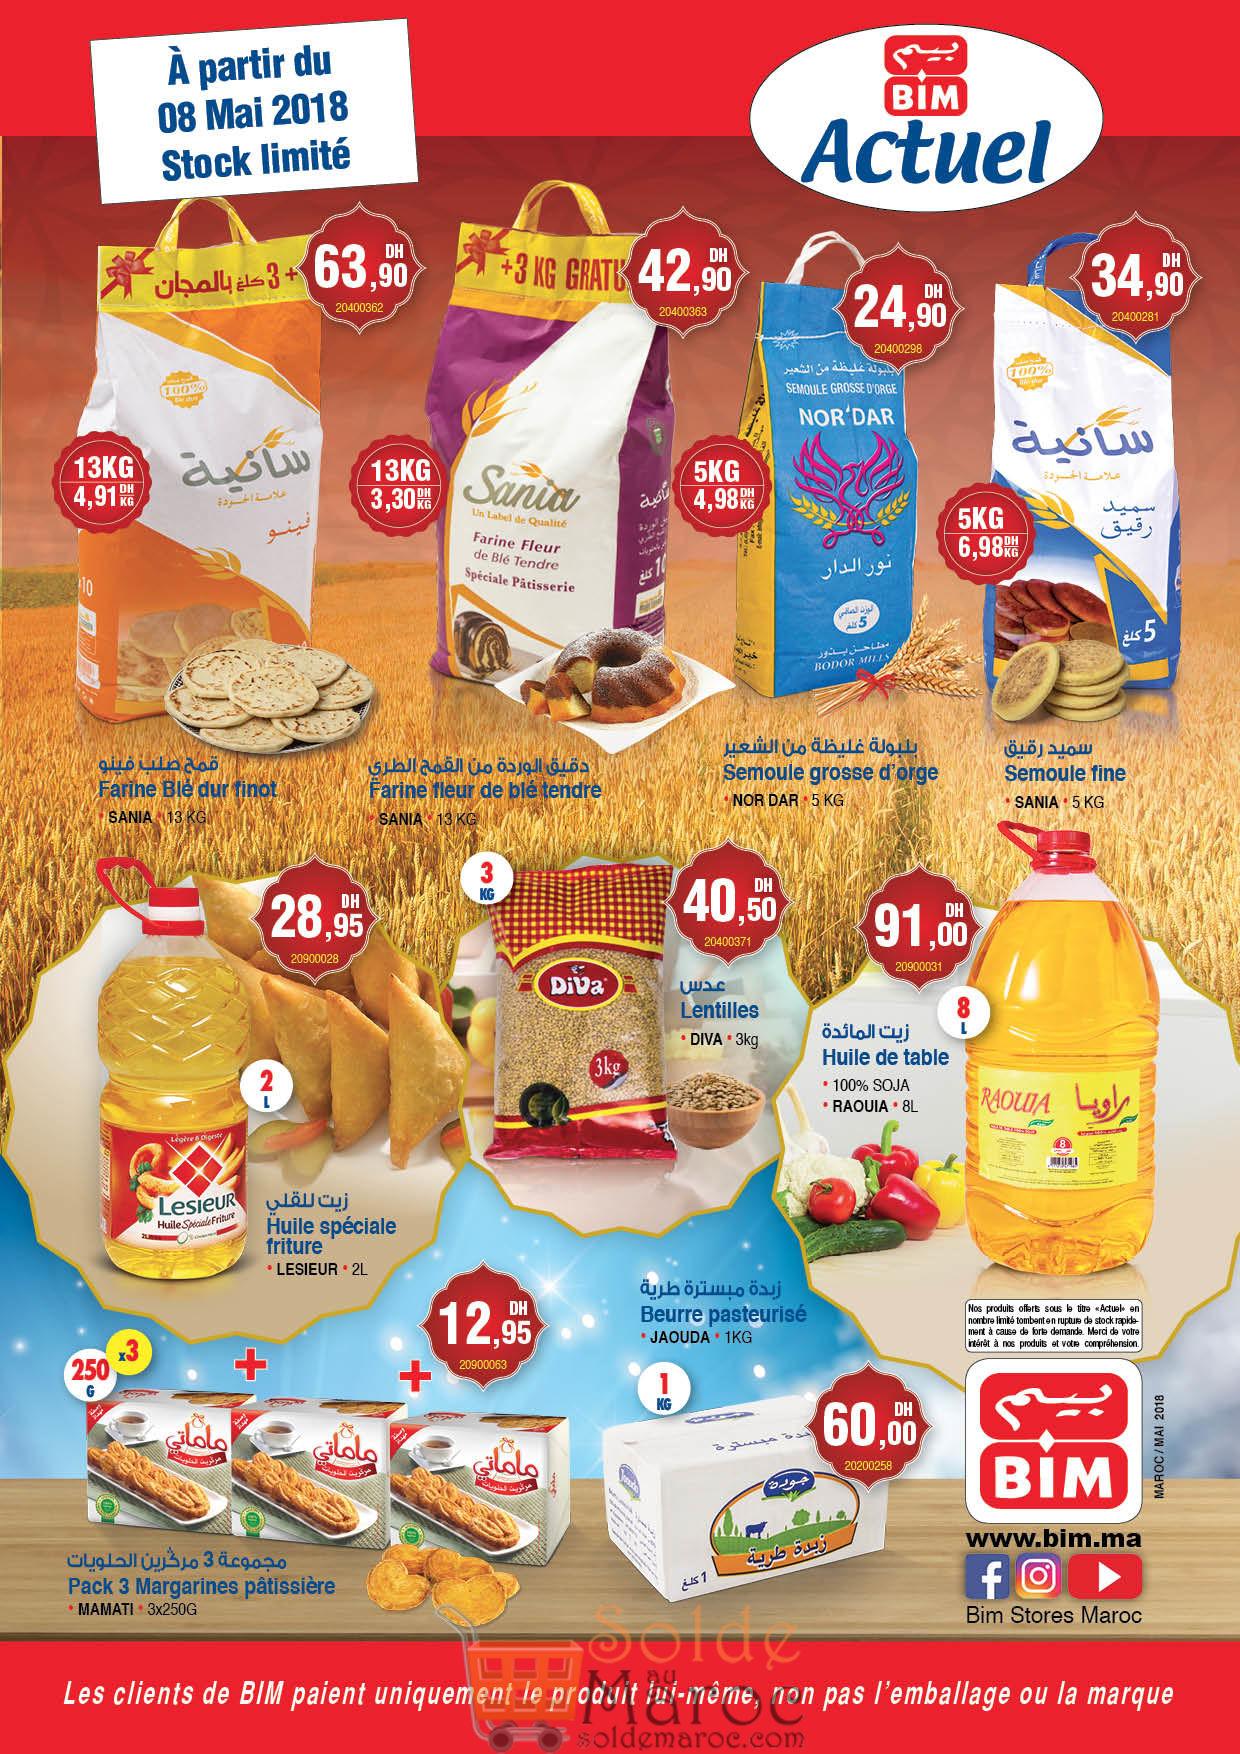 Supplément Catalogue Bim Maroc du Mardi 8 Mai 2018